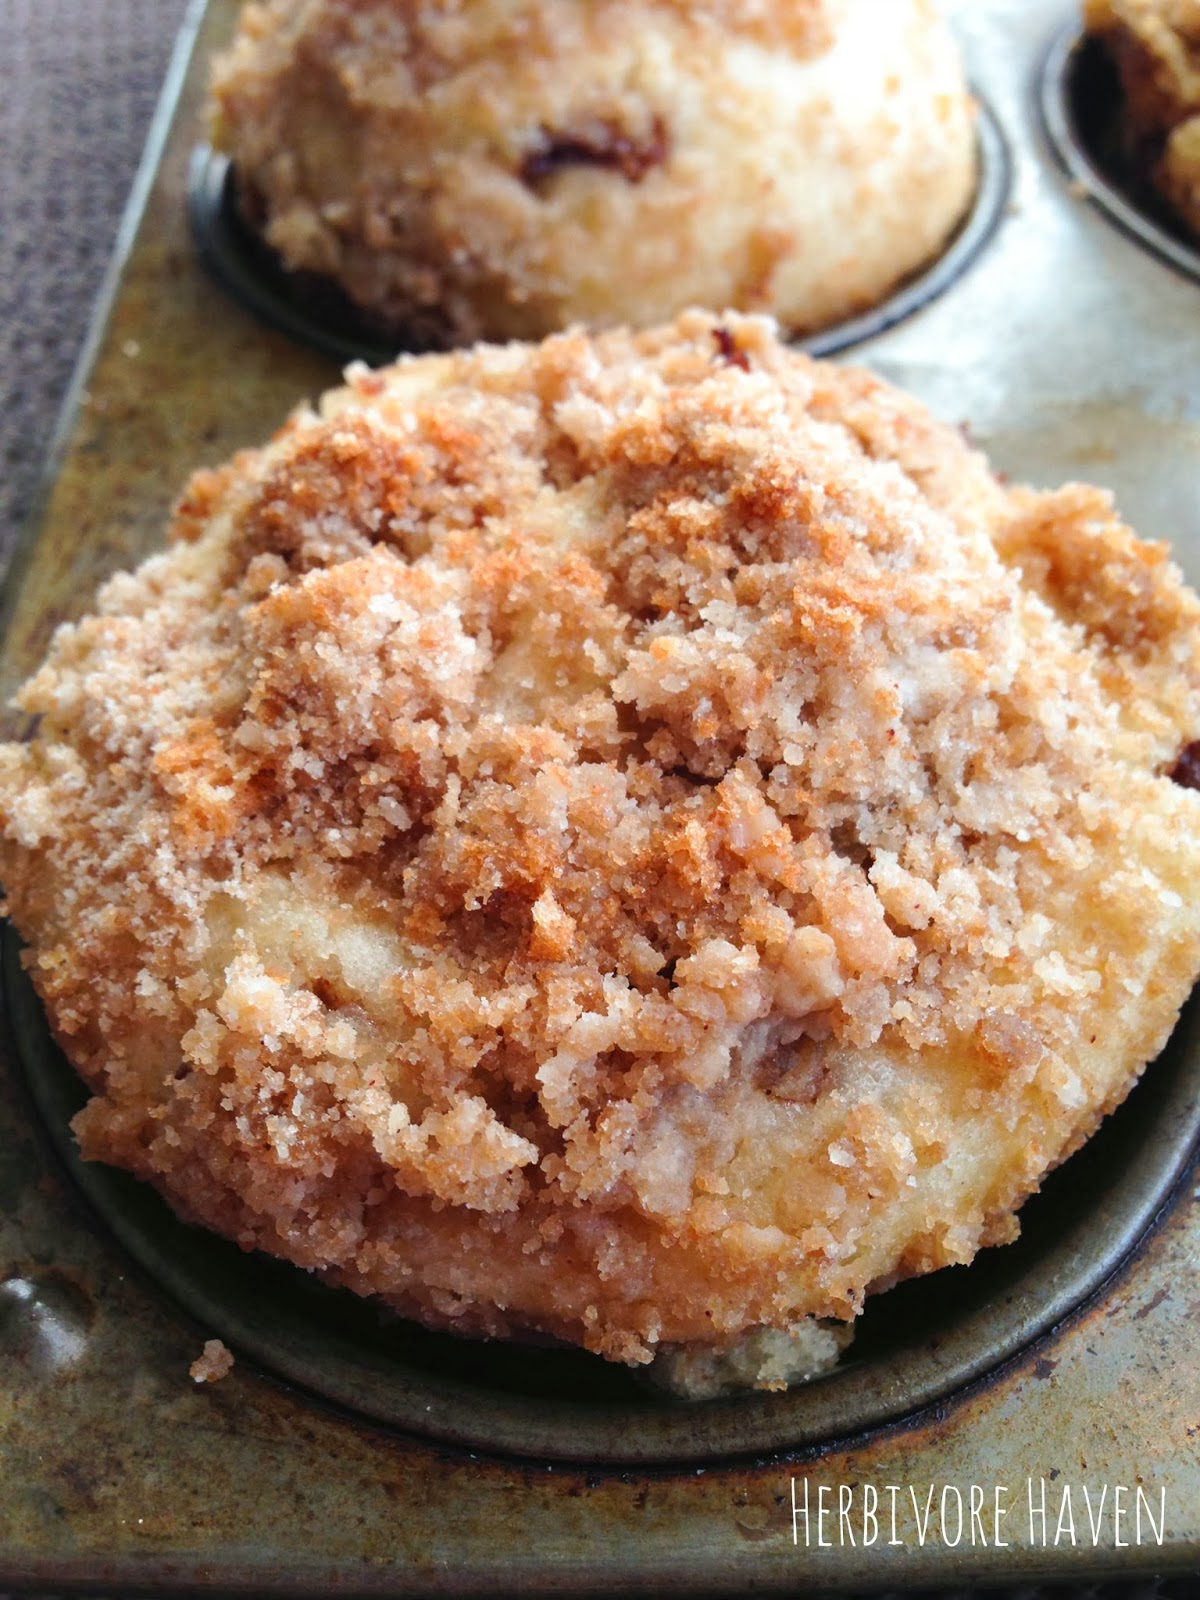 Herbivore Haven: Cinnamon Swirl Coffee Cake Muffins